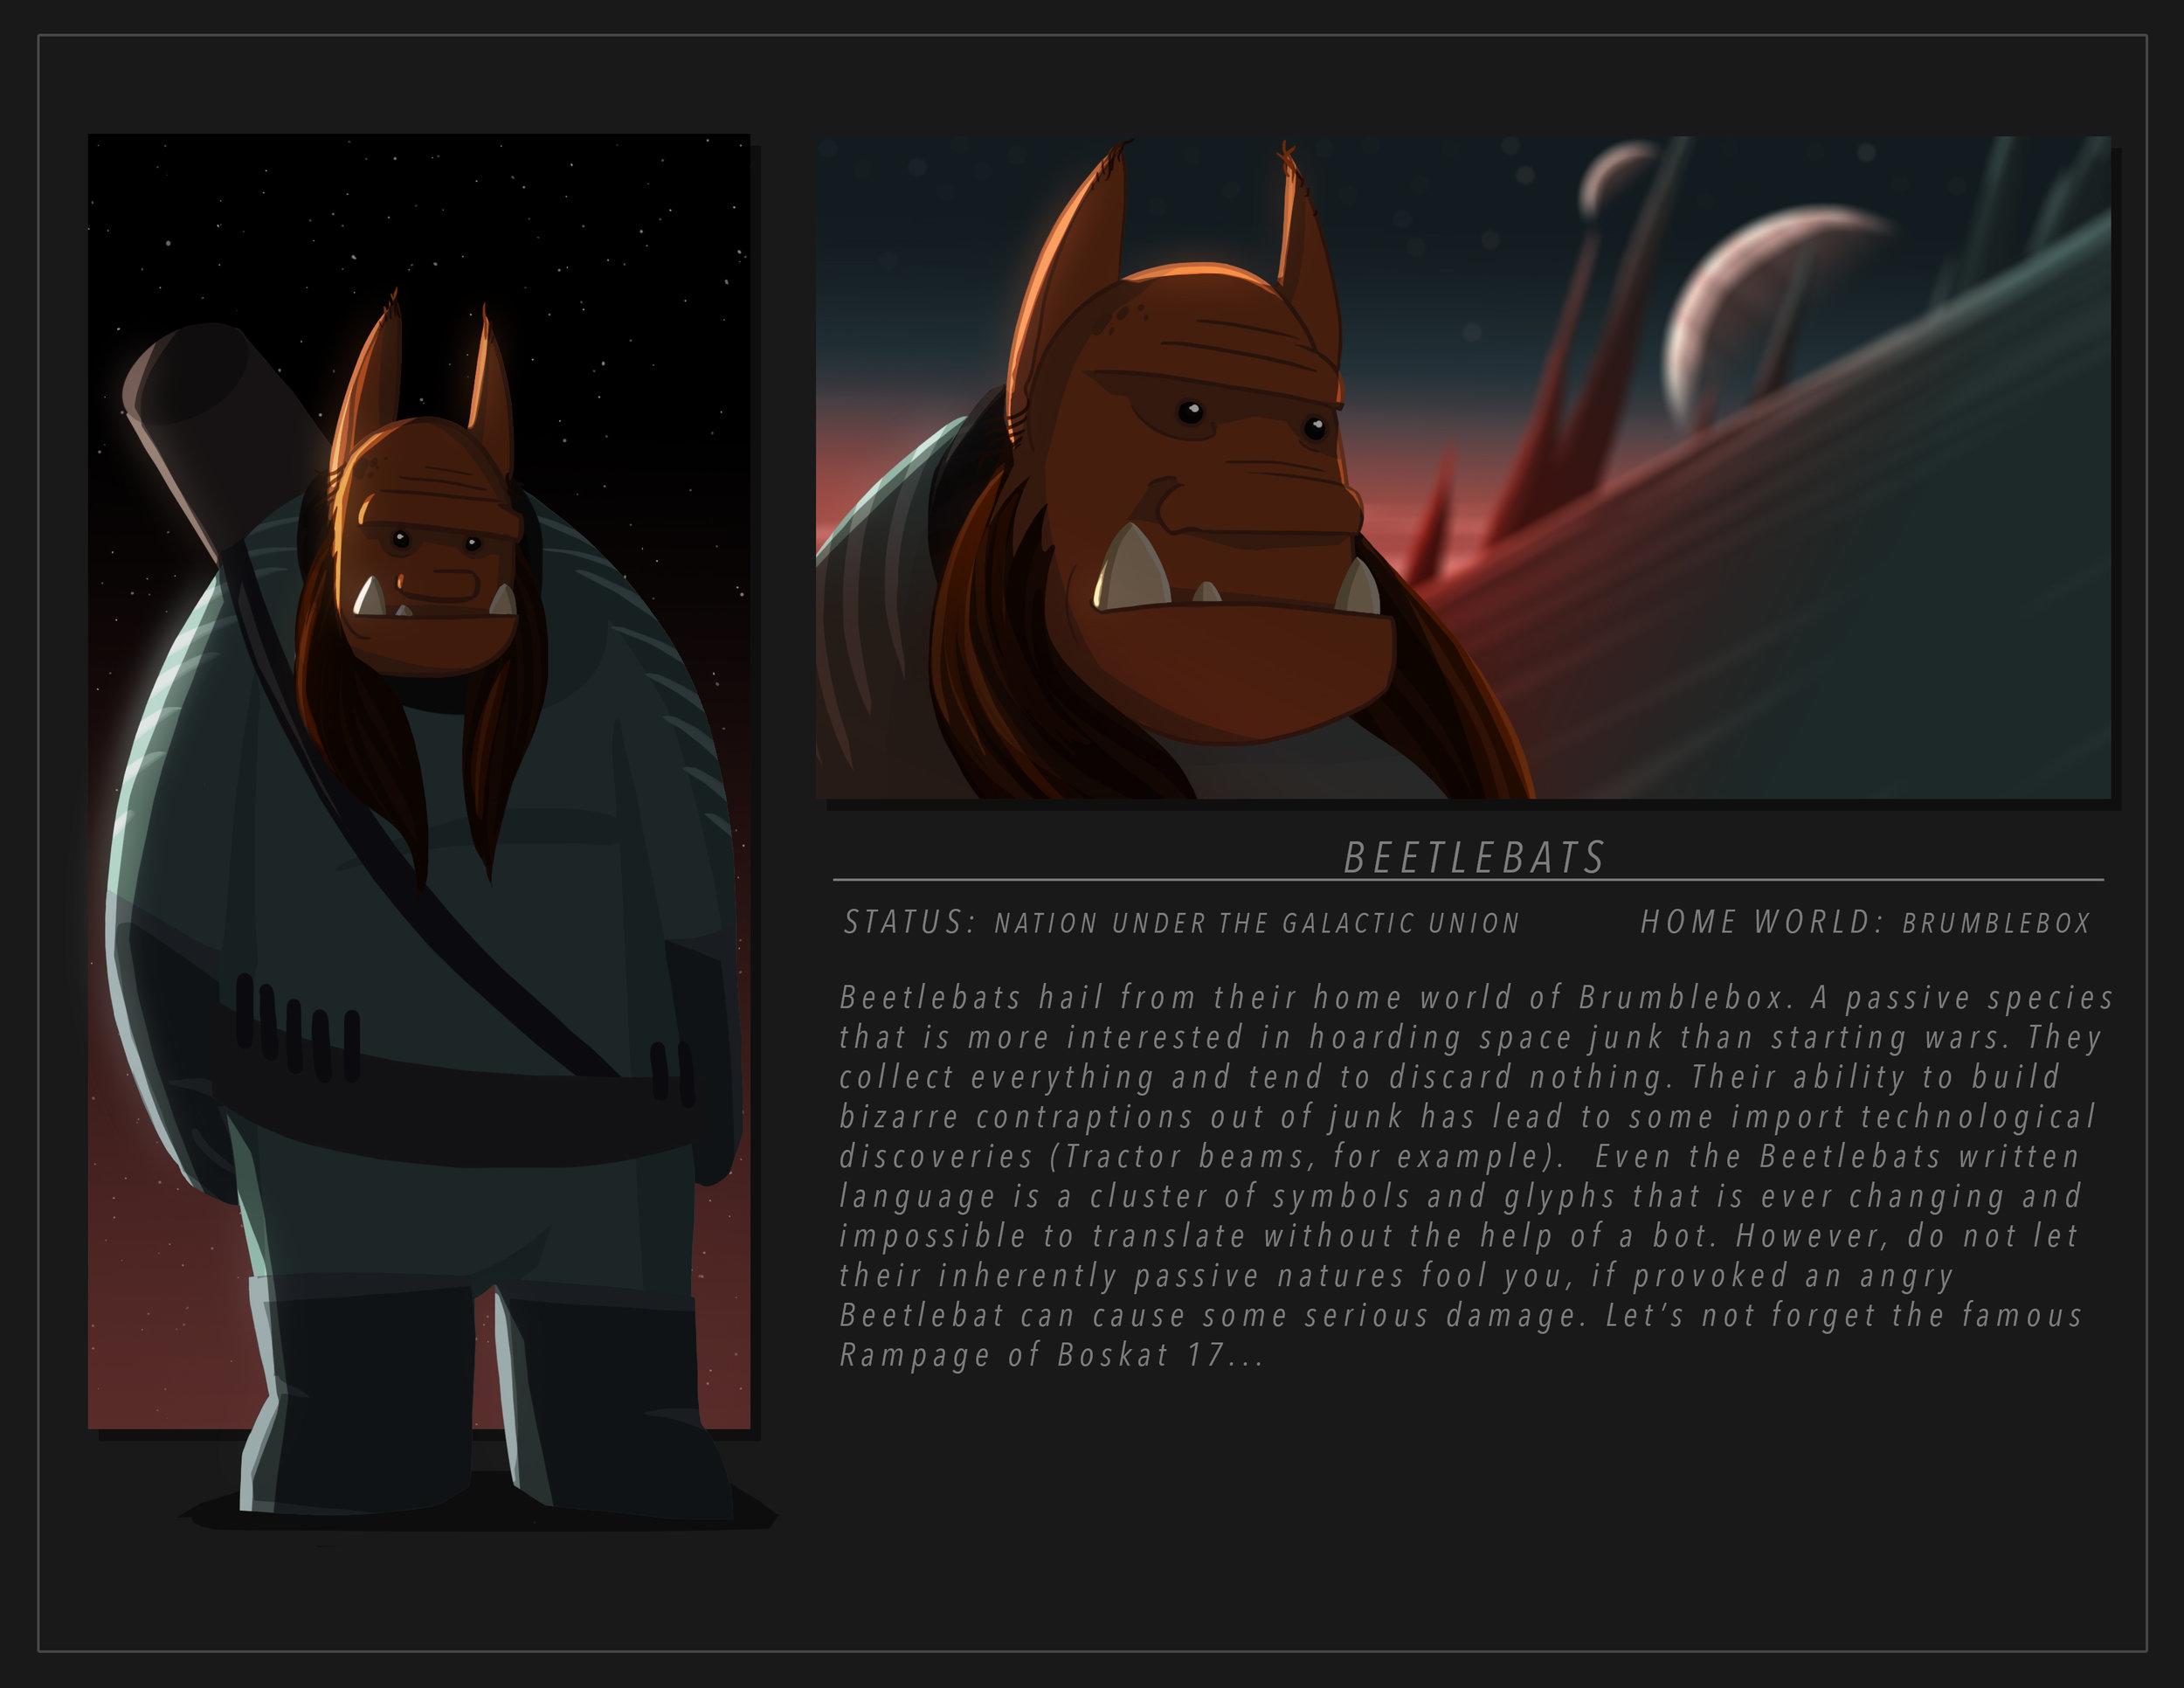 0_Alien_Beetlebats_v03.jpg